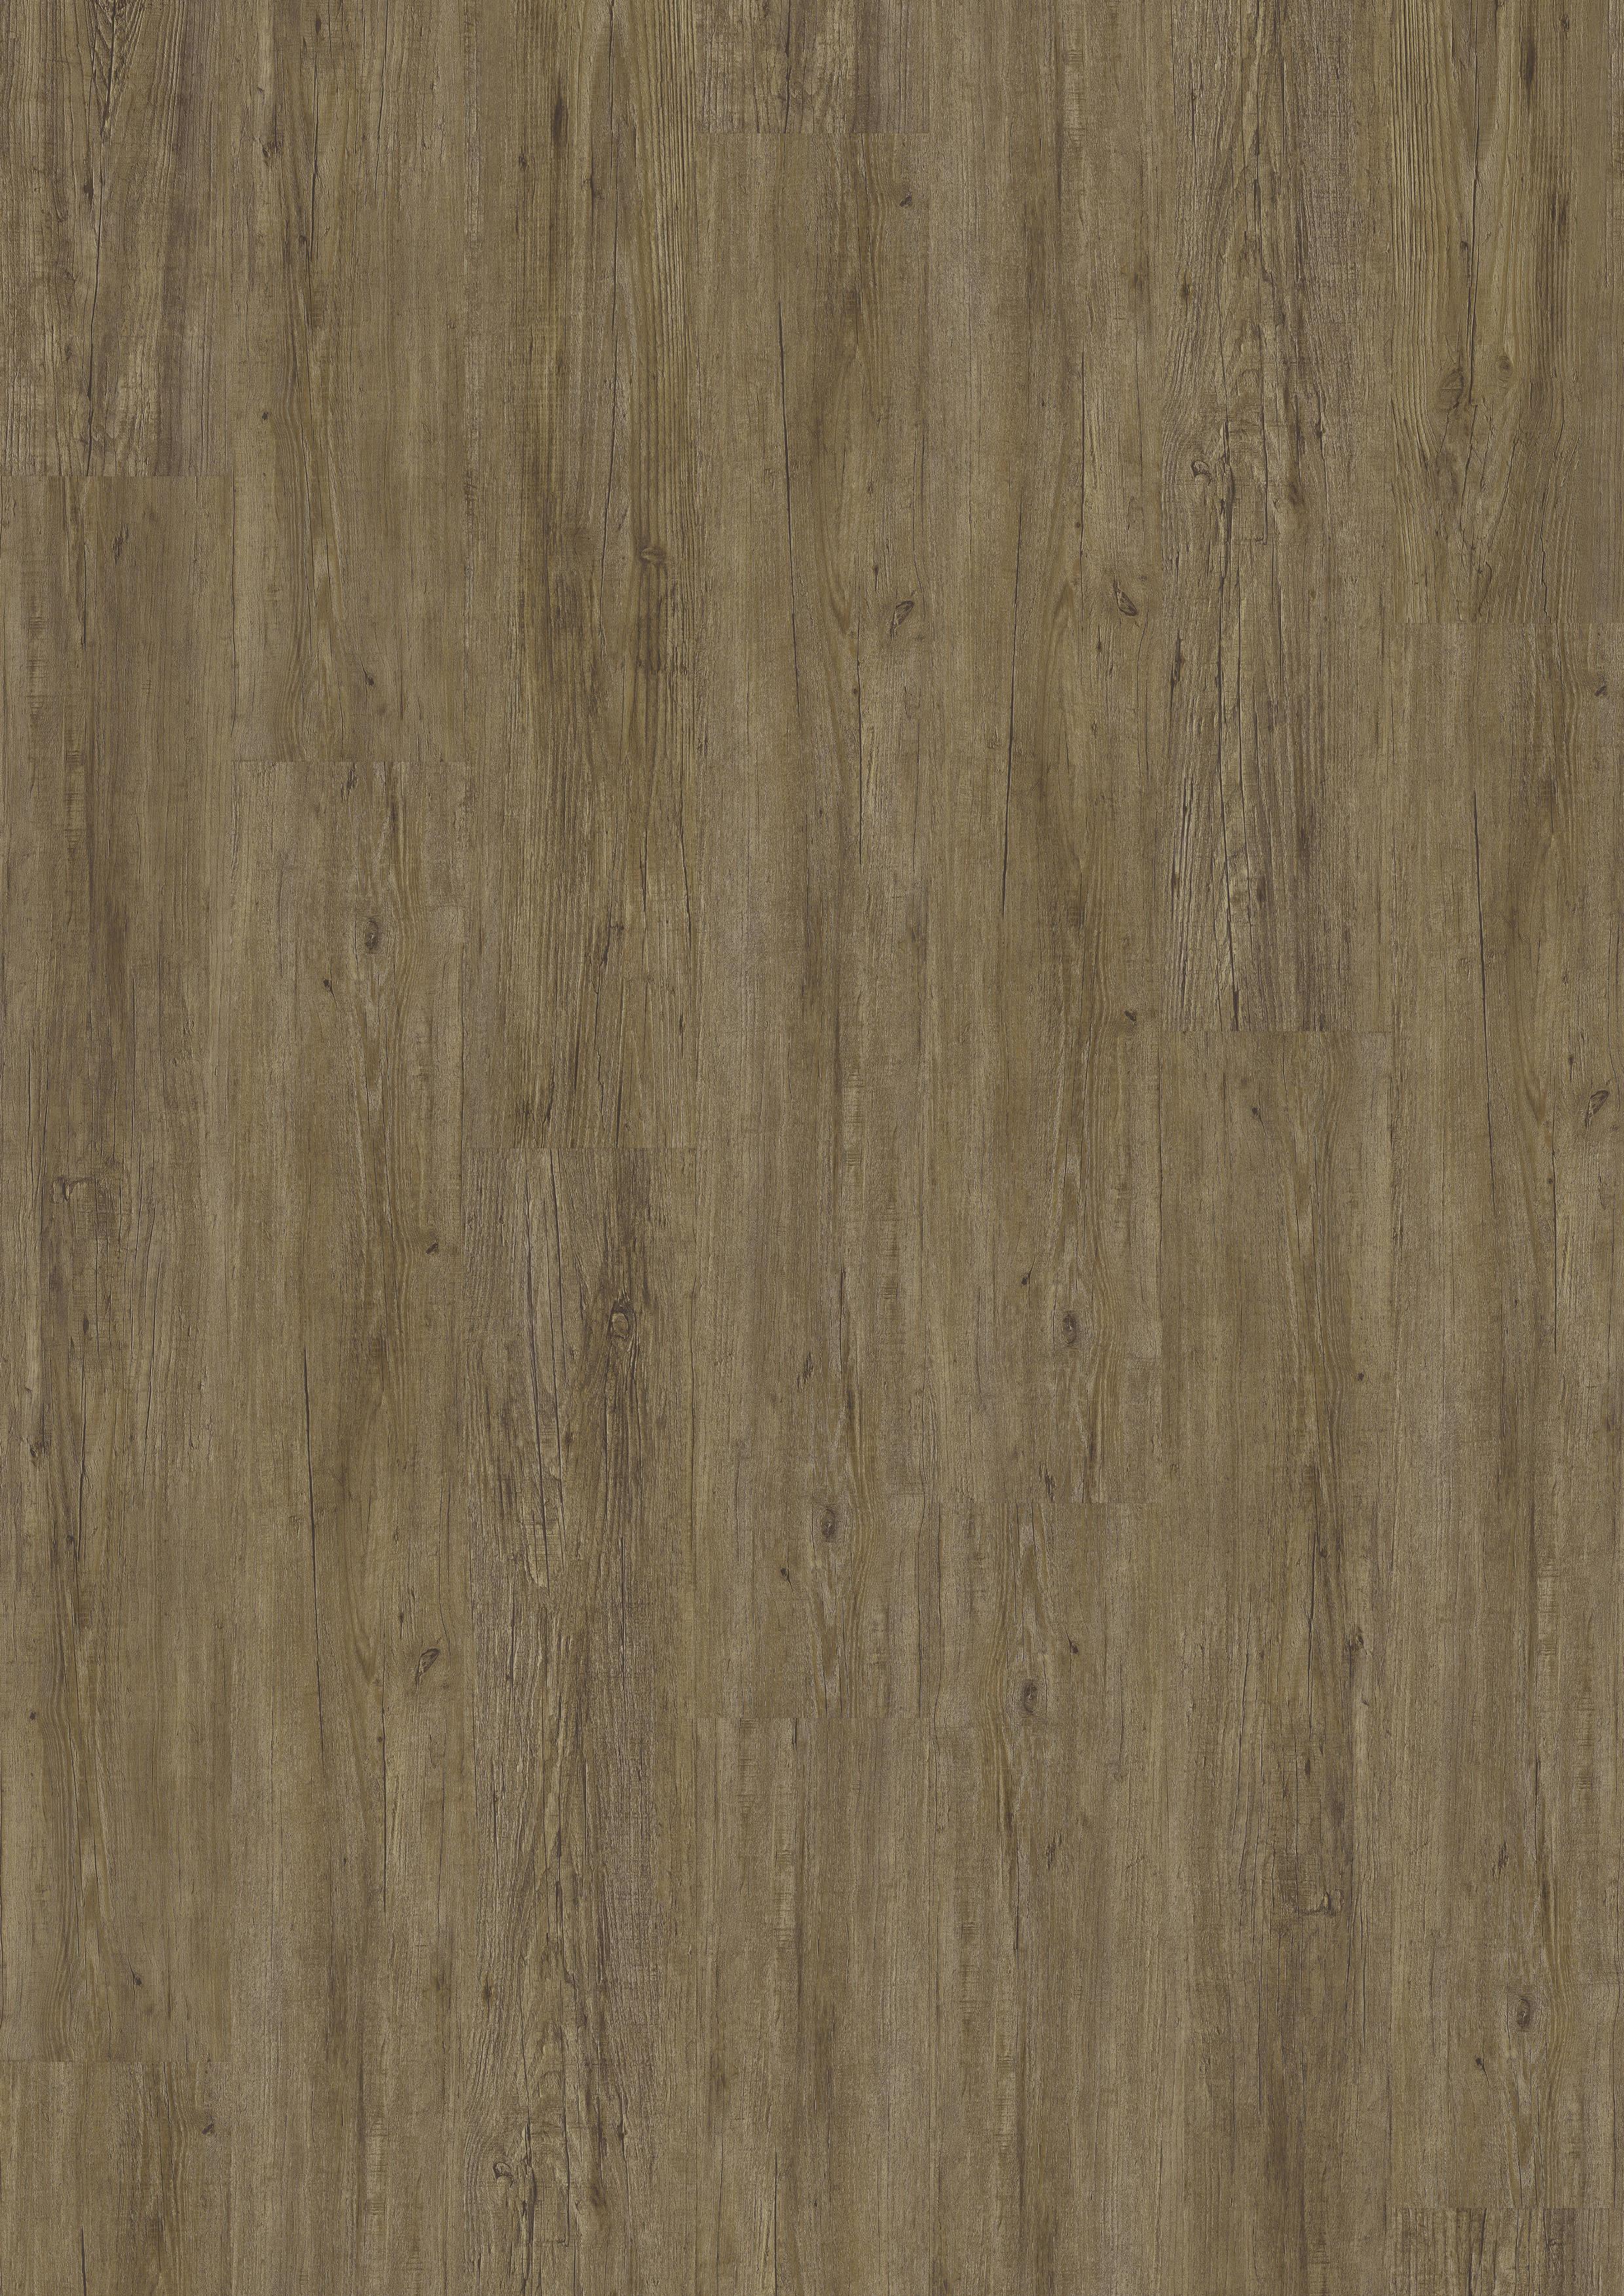 JOKA Designboden 330 Barrel Pine 2839